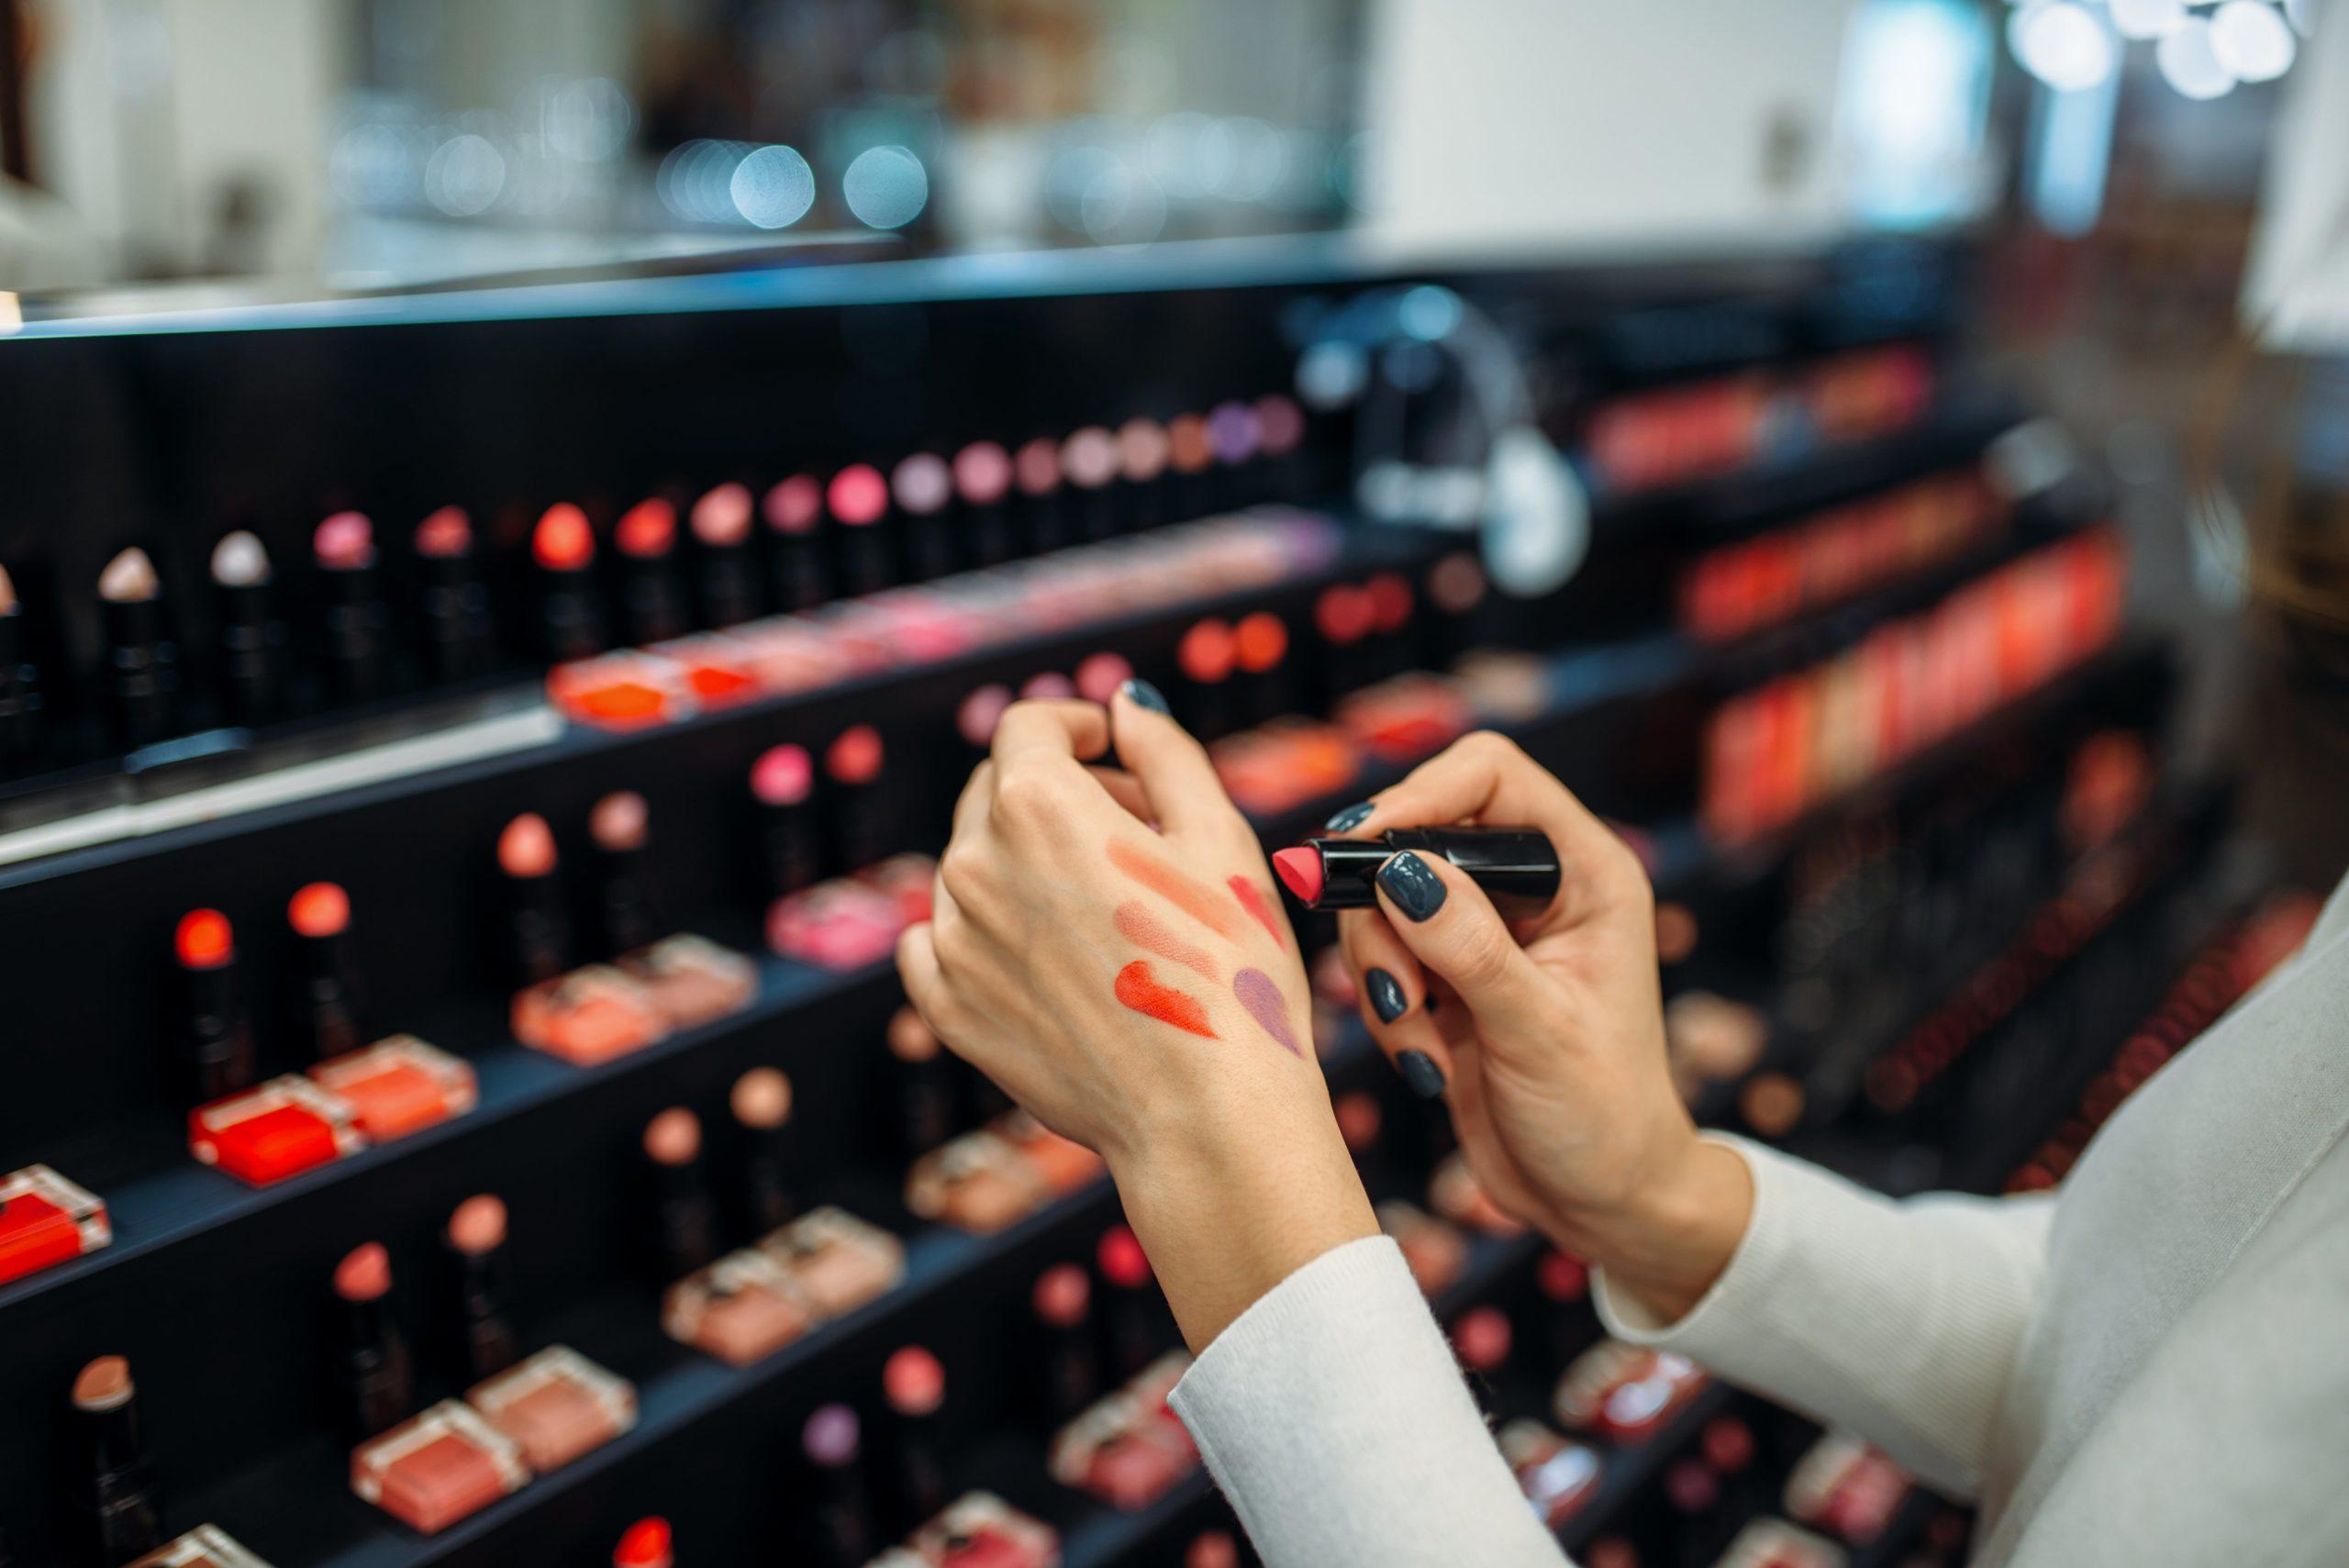 marra drugstore make up